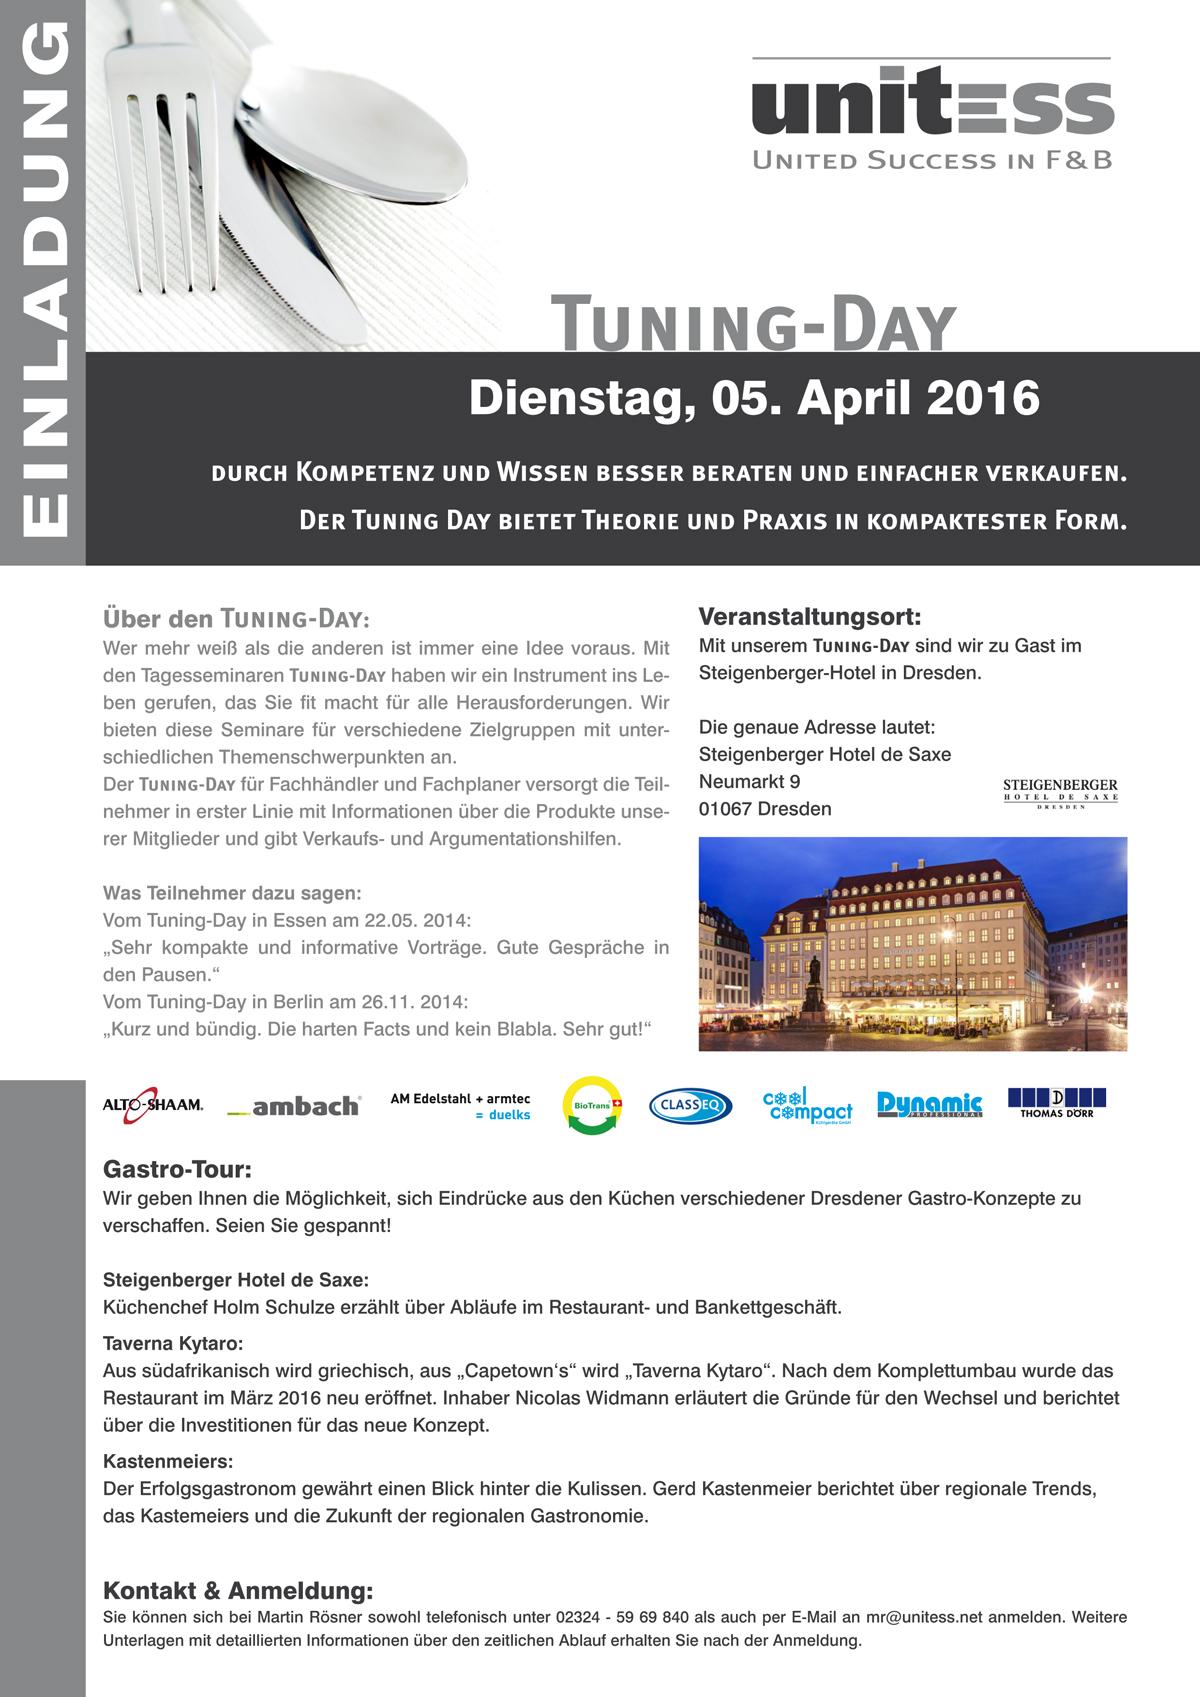 Unitess Einladung Tuning-Day 2016 Dresden Print in